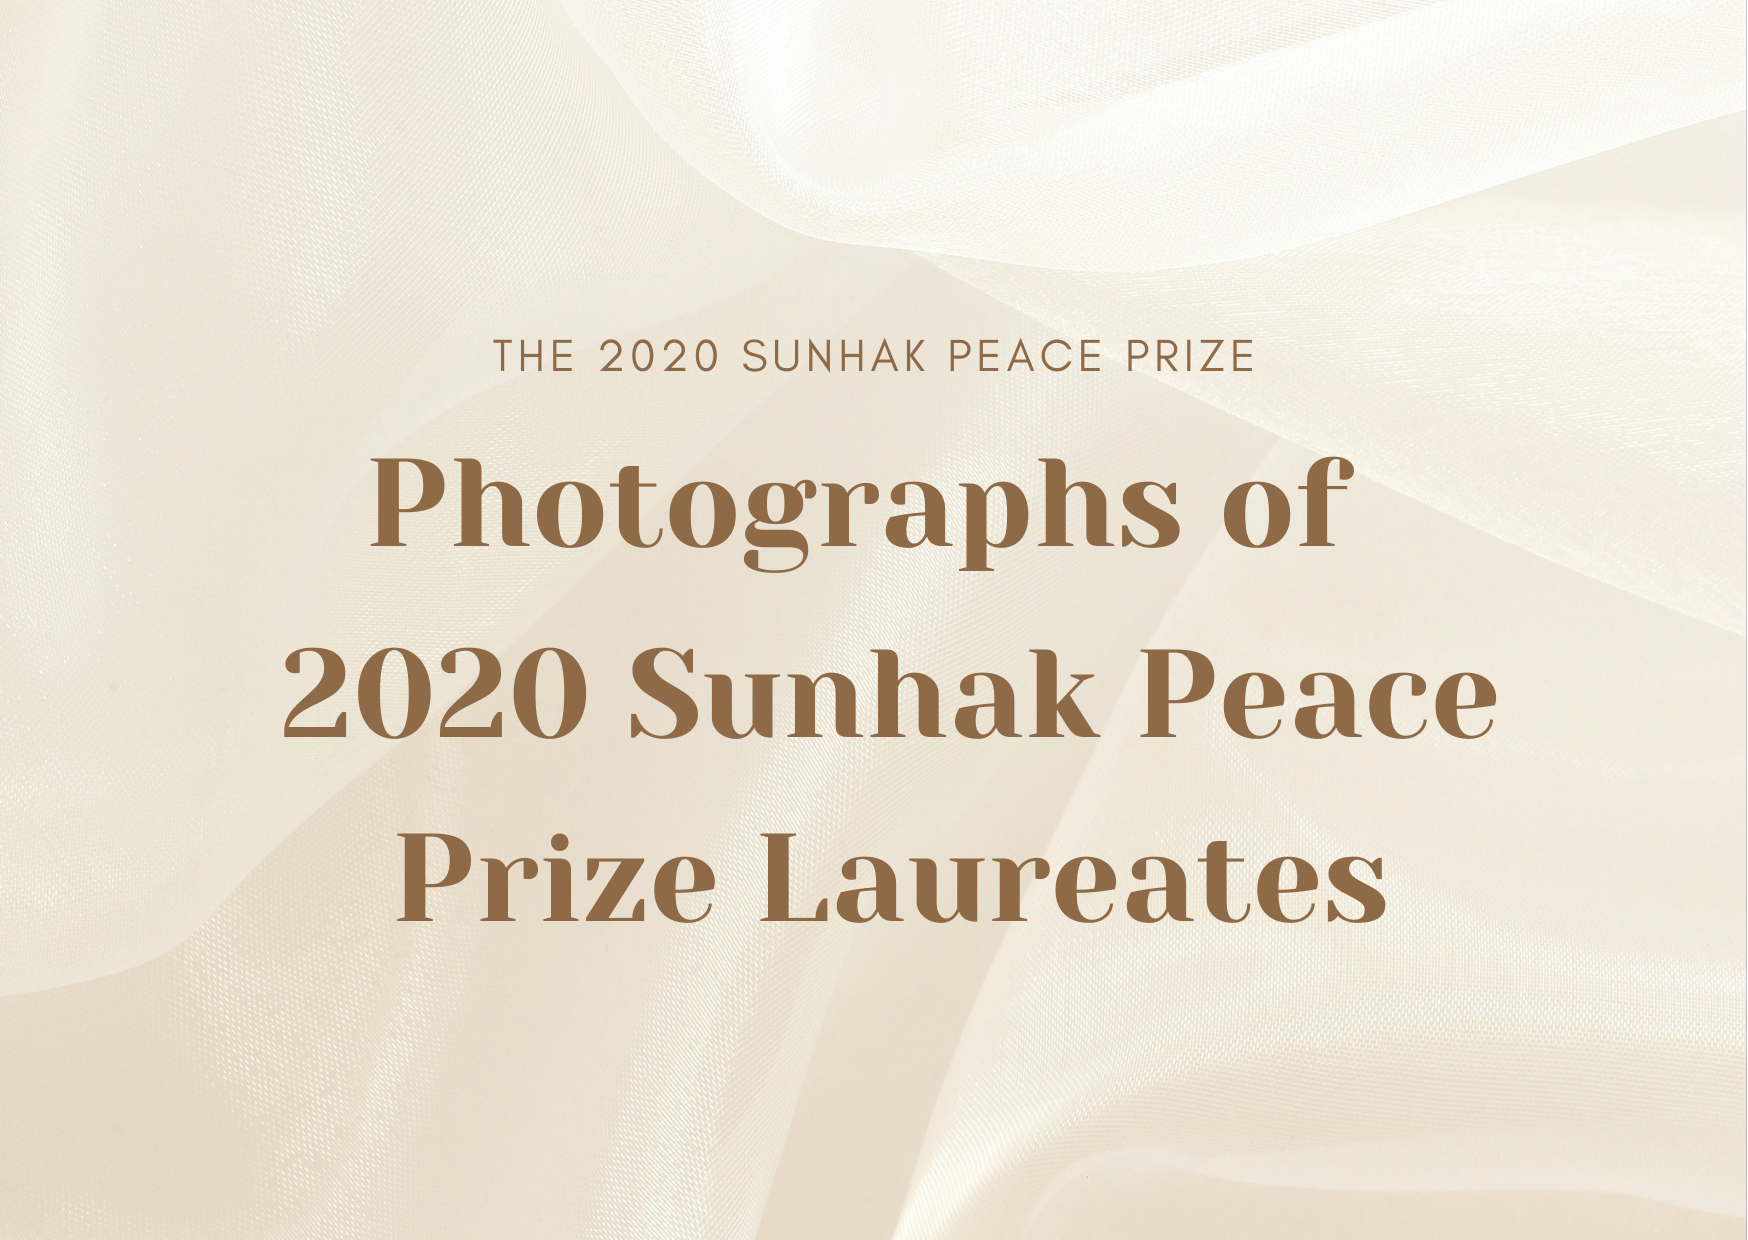 Photographs of 2020 Sunhak Peace Prize Laureates 썸네일